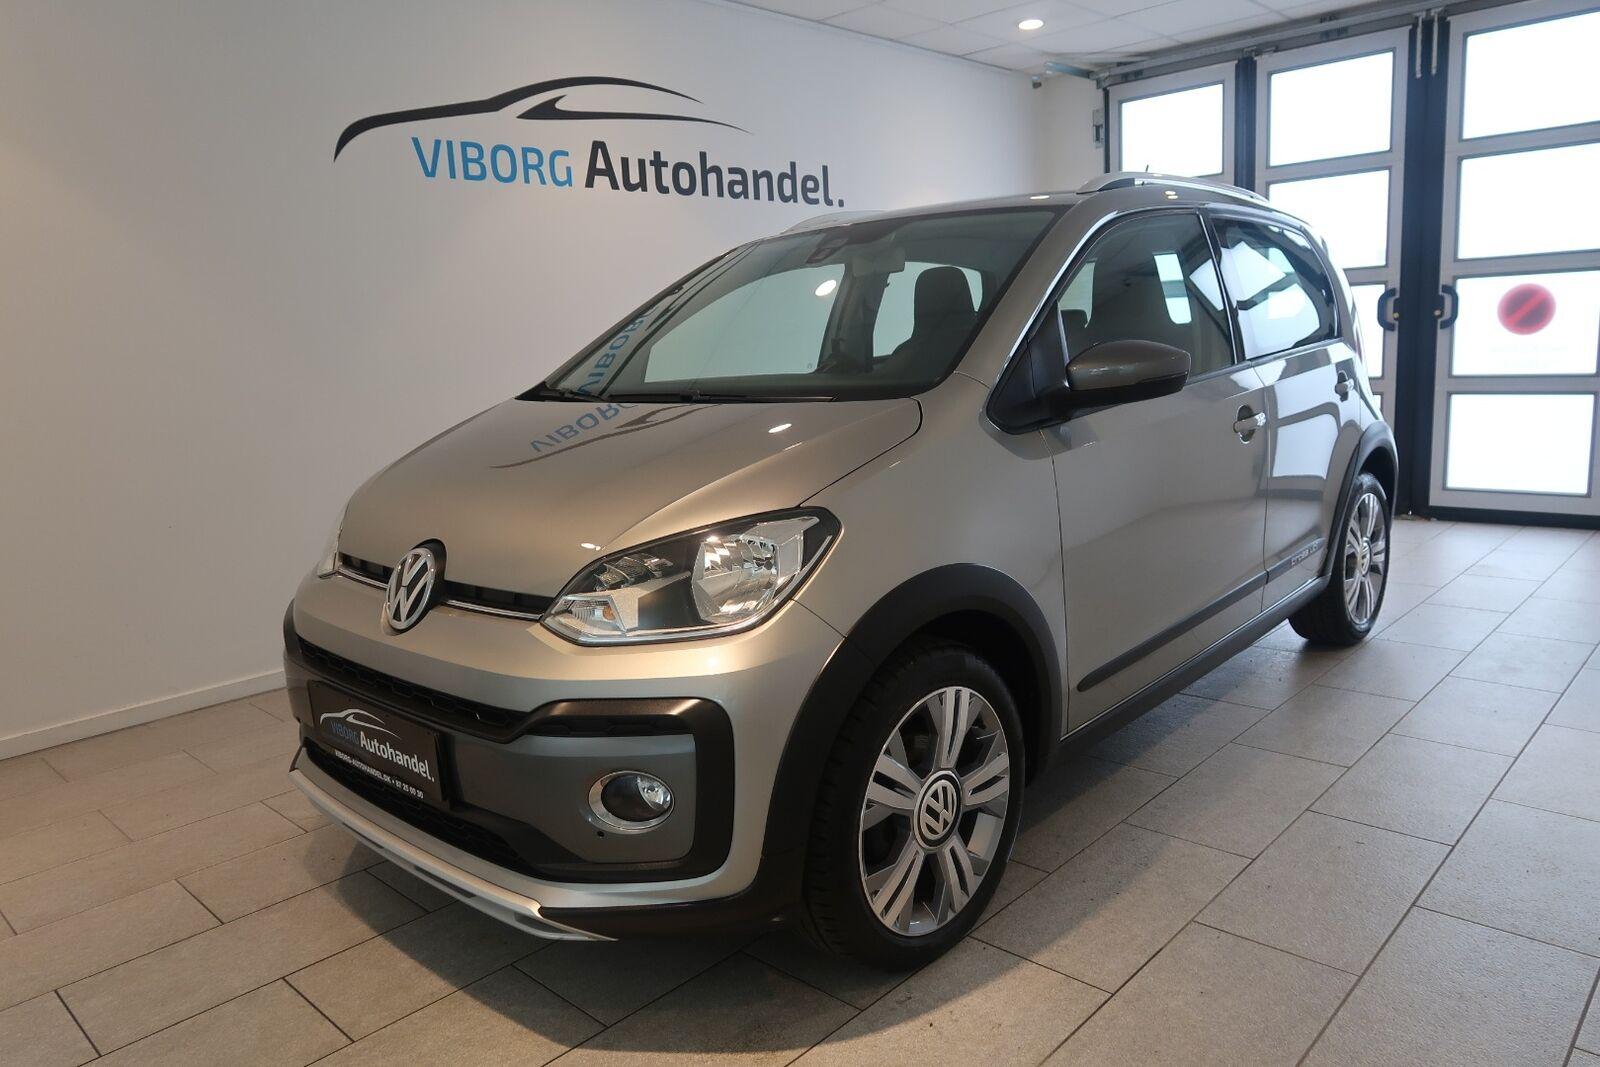 VW Up! Cross 1,0 MPi 75 5d